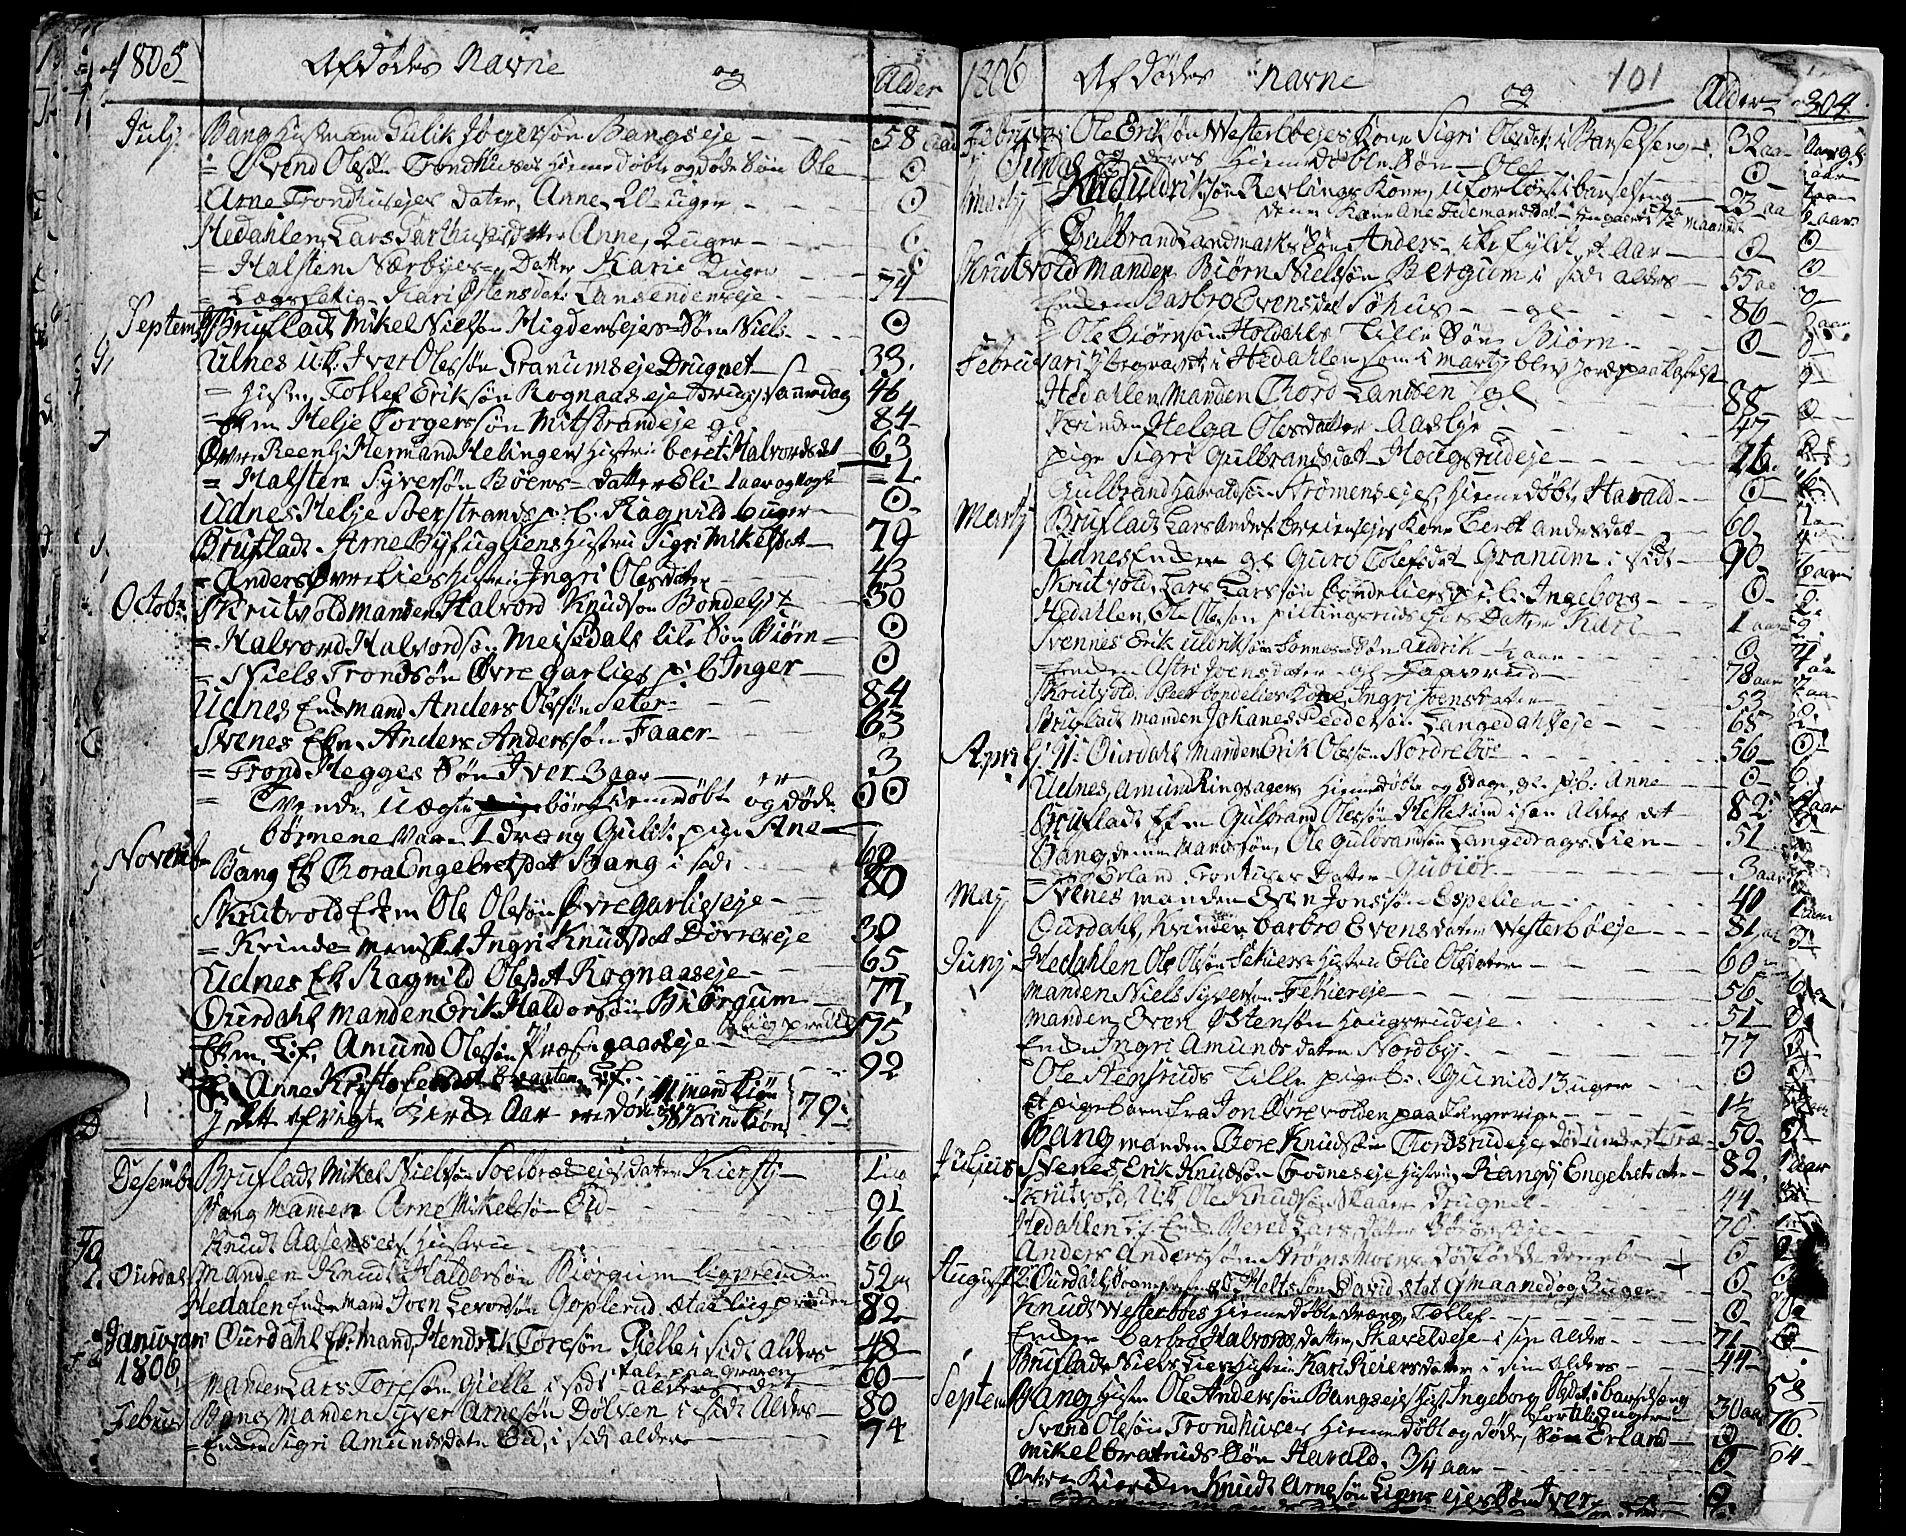 SAH, Aurdal prestekontor, Ministerialbok nr. 7, 1800-1808, s. 101